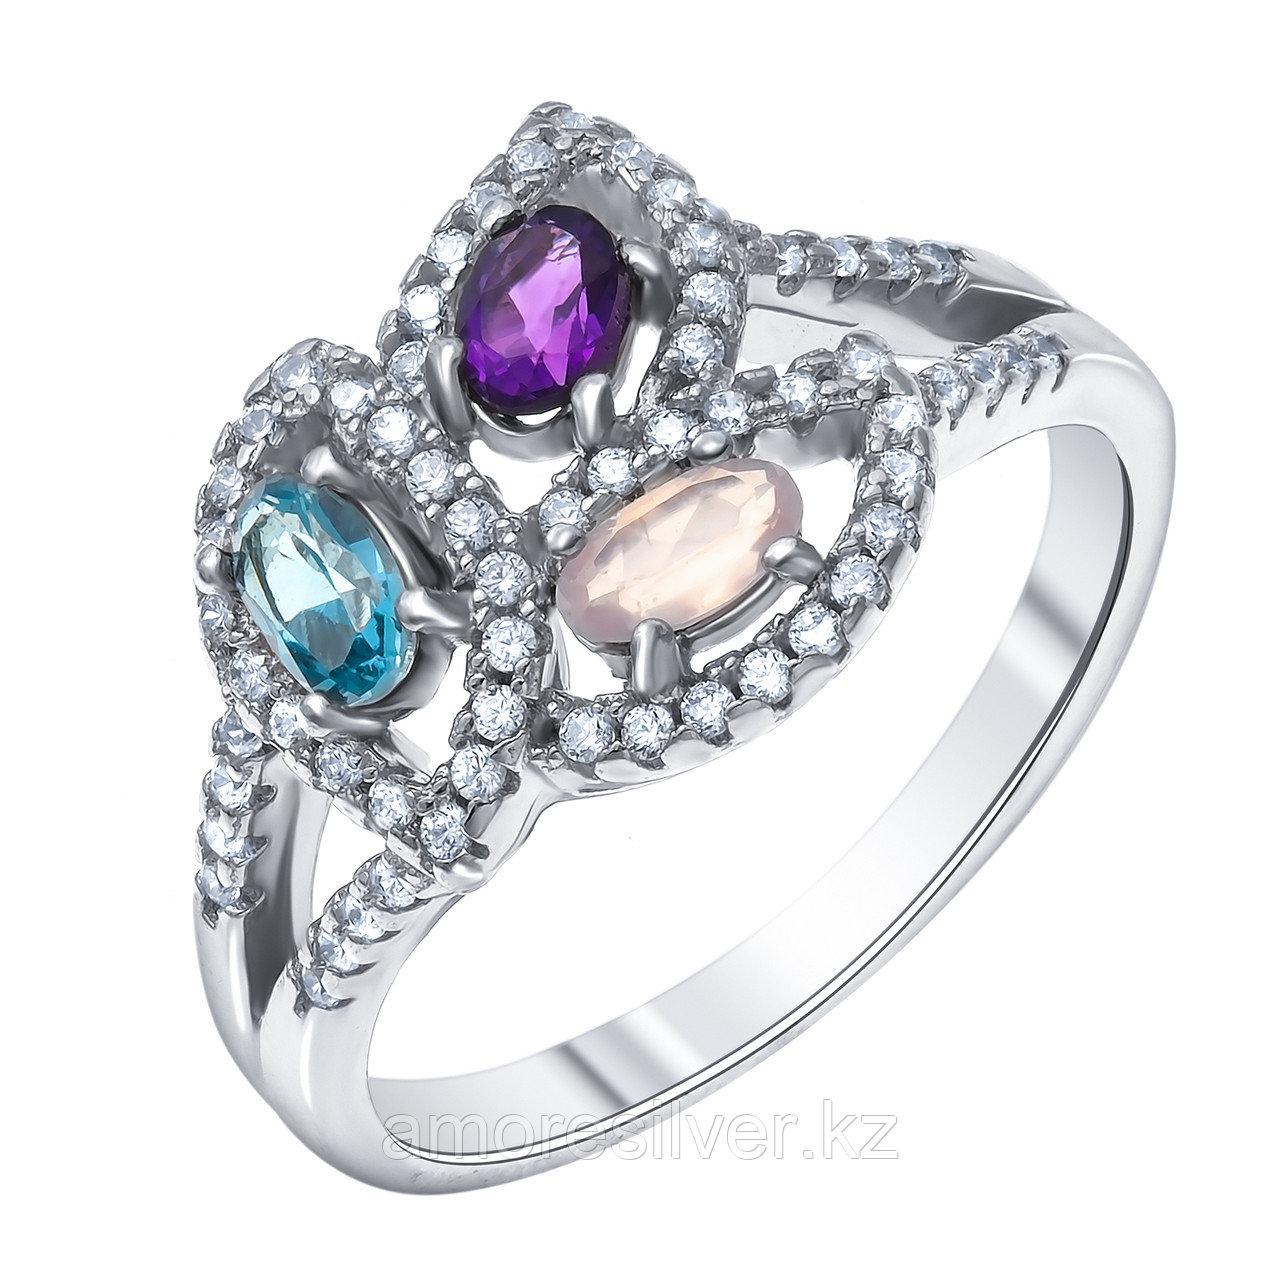 Кольцо TEOSA серебро с родием, аметист кварц розовый топаз фианит, флора R-DRGR00066-AM-QP-T